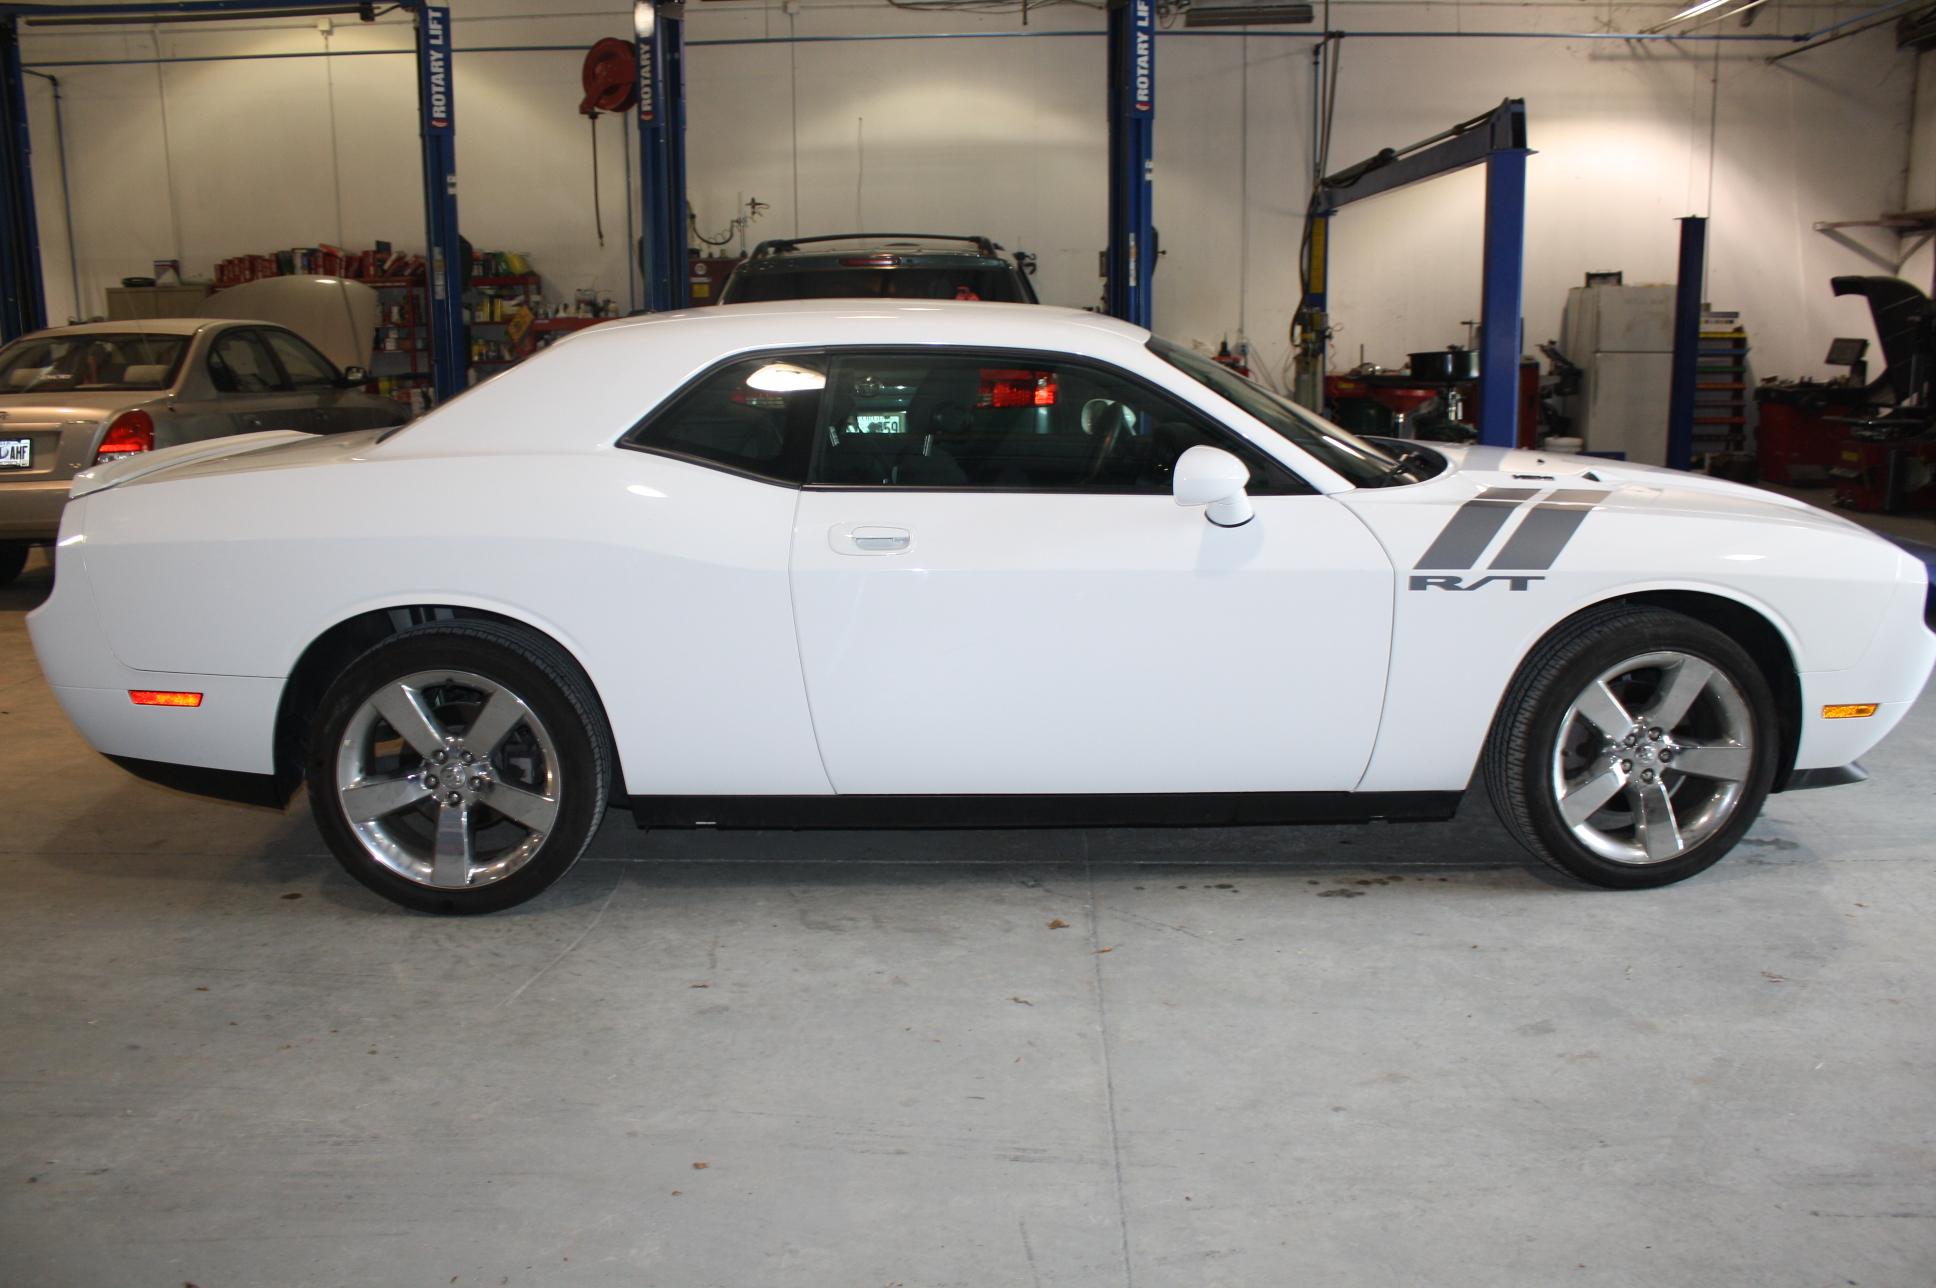 2010 Dodge Challenger R/T 2D Coupe   Diminished Value Car Appraisal